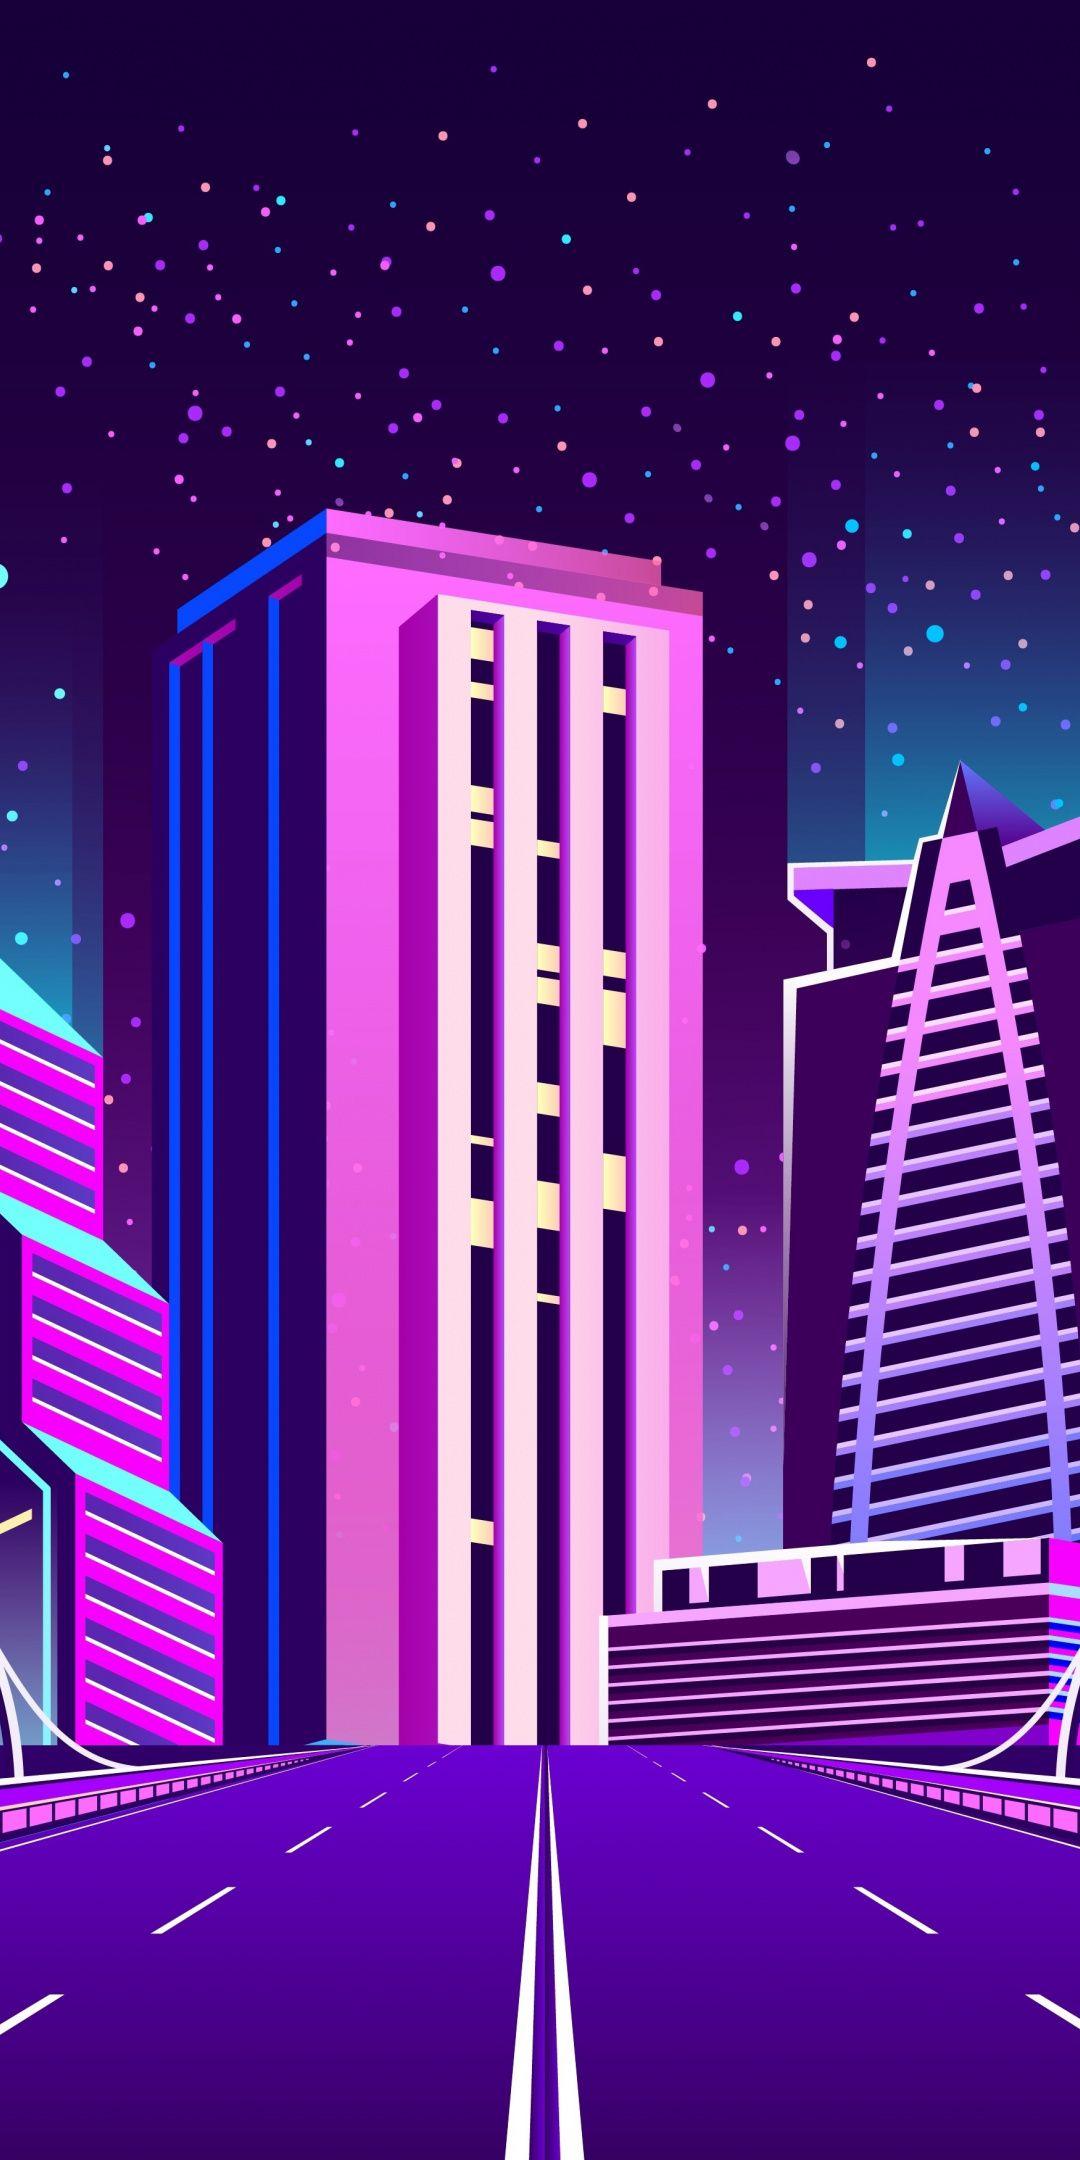 Digital art, road to city, cityscape, buildings, 1080x2160 wallpaper